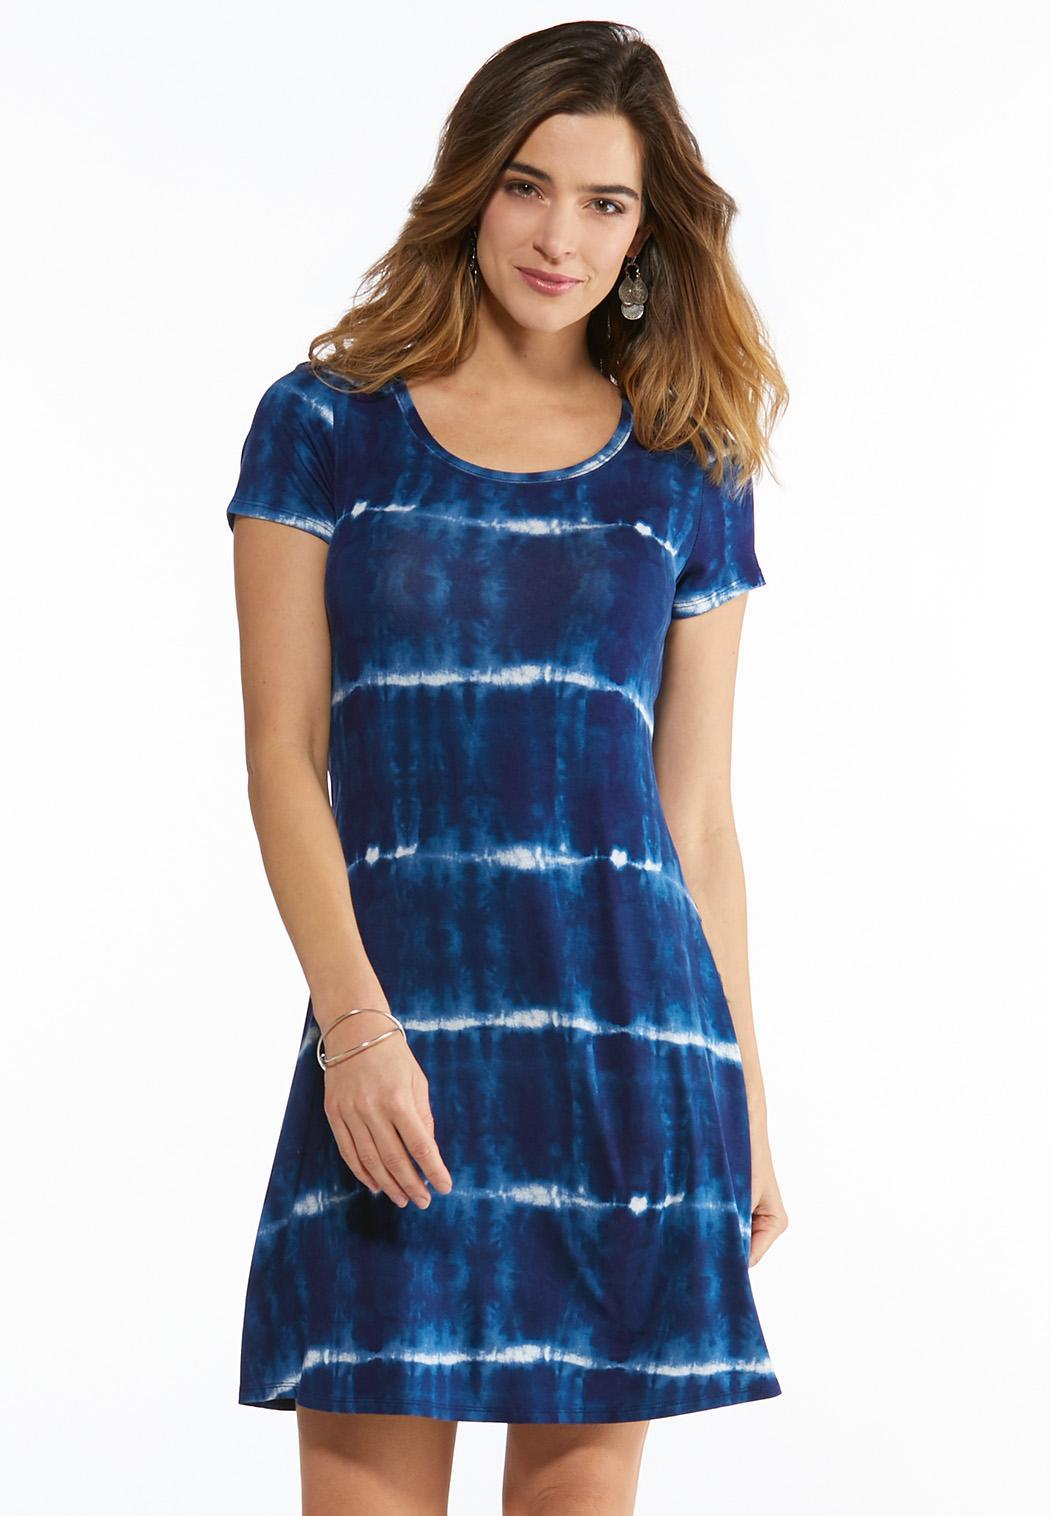 9805737c9bb9 Tie Dye Bow Back Dress Junior/Misses Cato Fashions